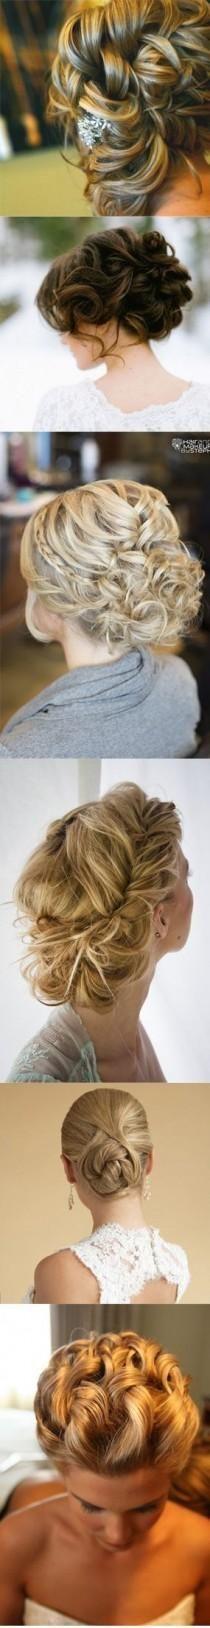 Weddings - Hair Affair